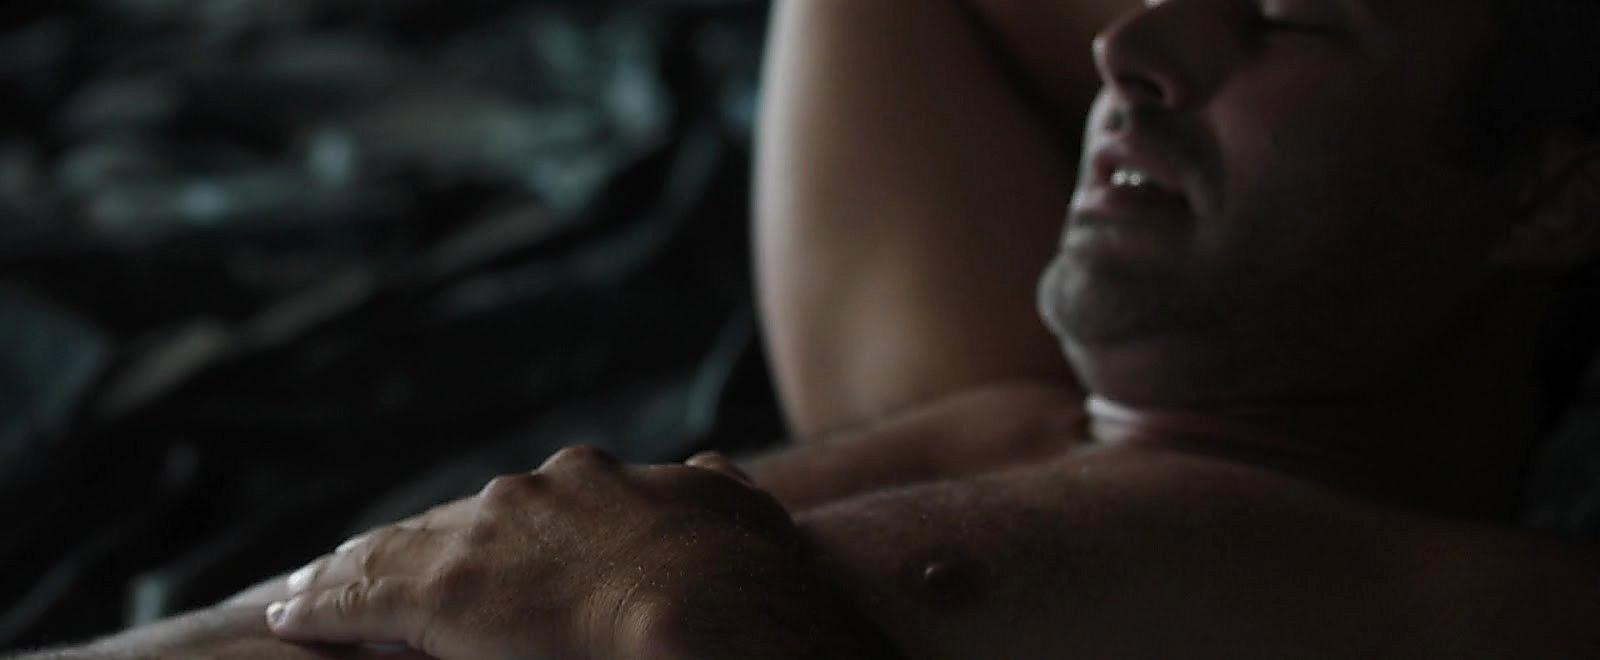 Taylor Kinney sexy shirtless scene November 10, 2018, 6am